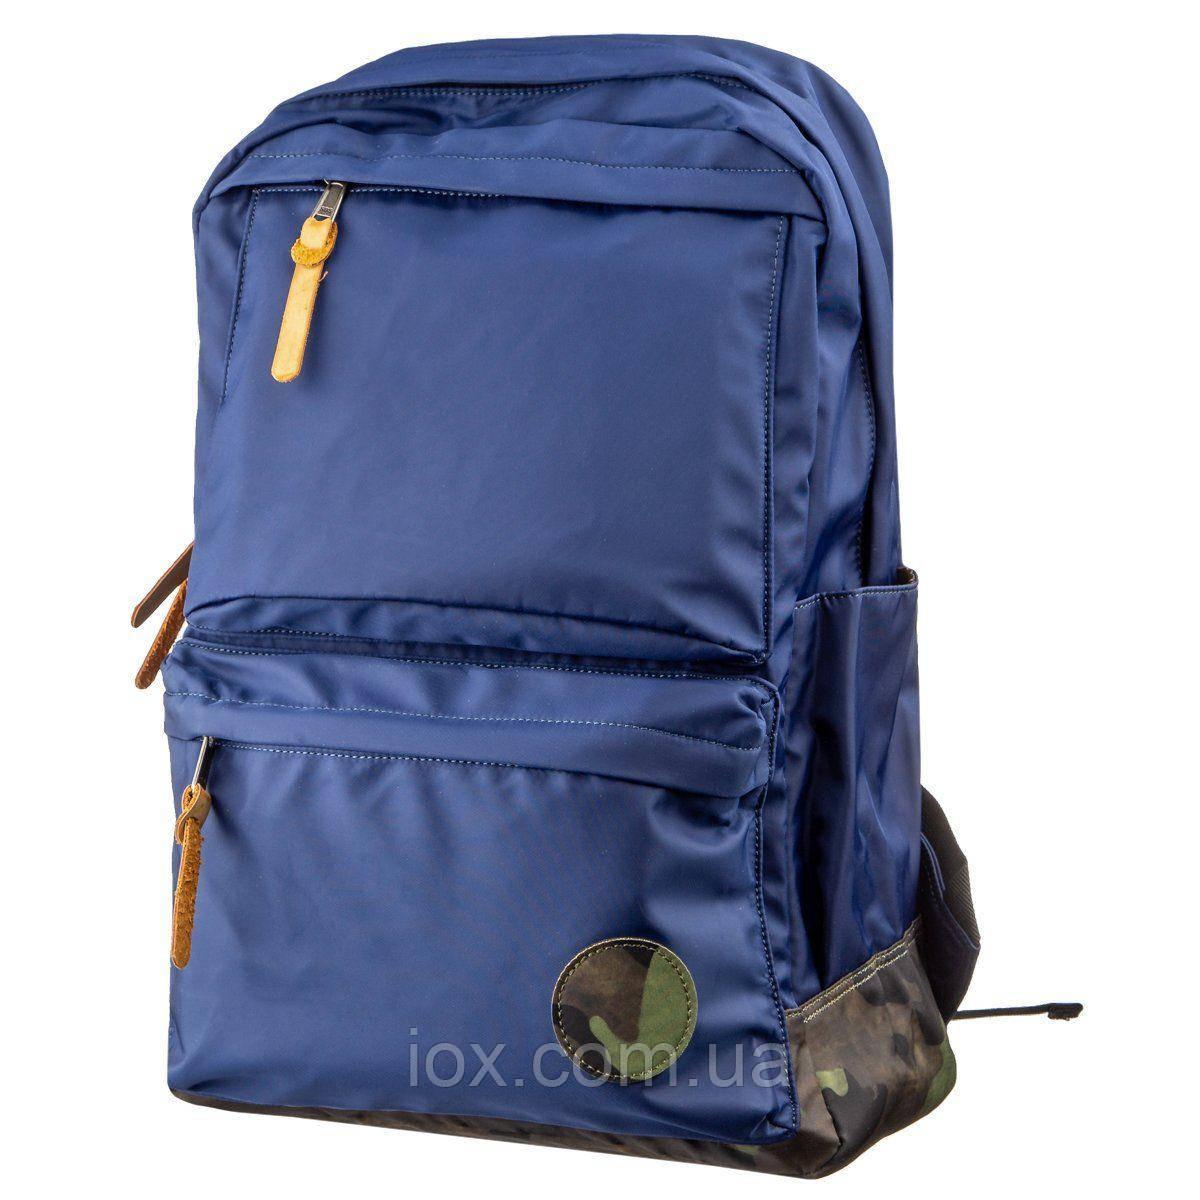 Рюкзак нейлоновый Vintage 14821 Синий, Синий, фото 1